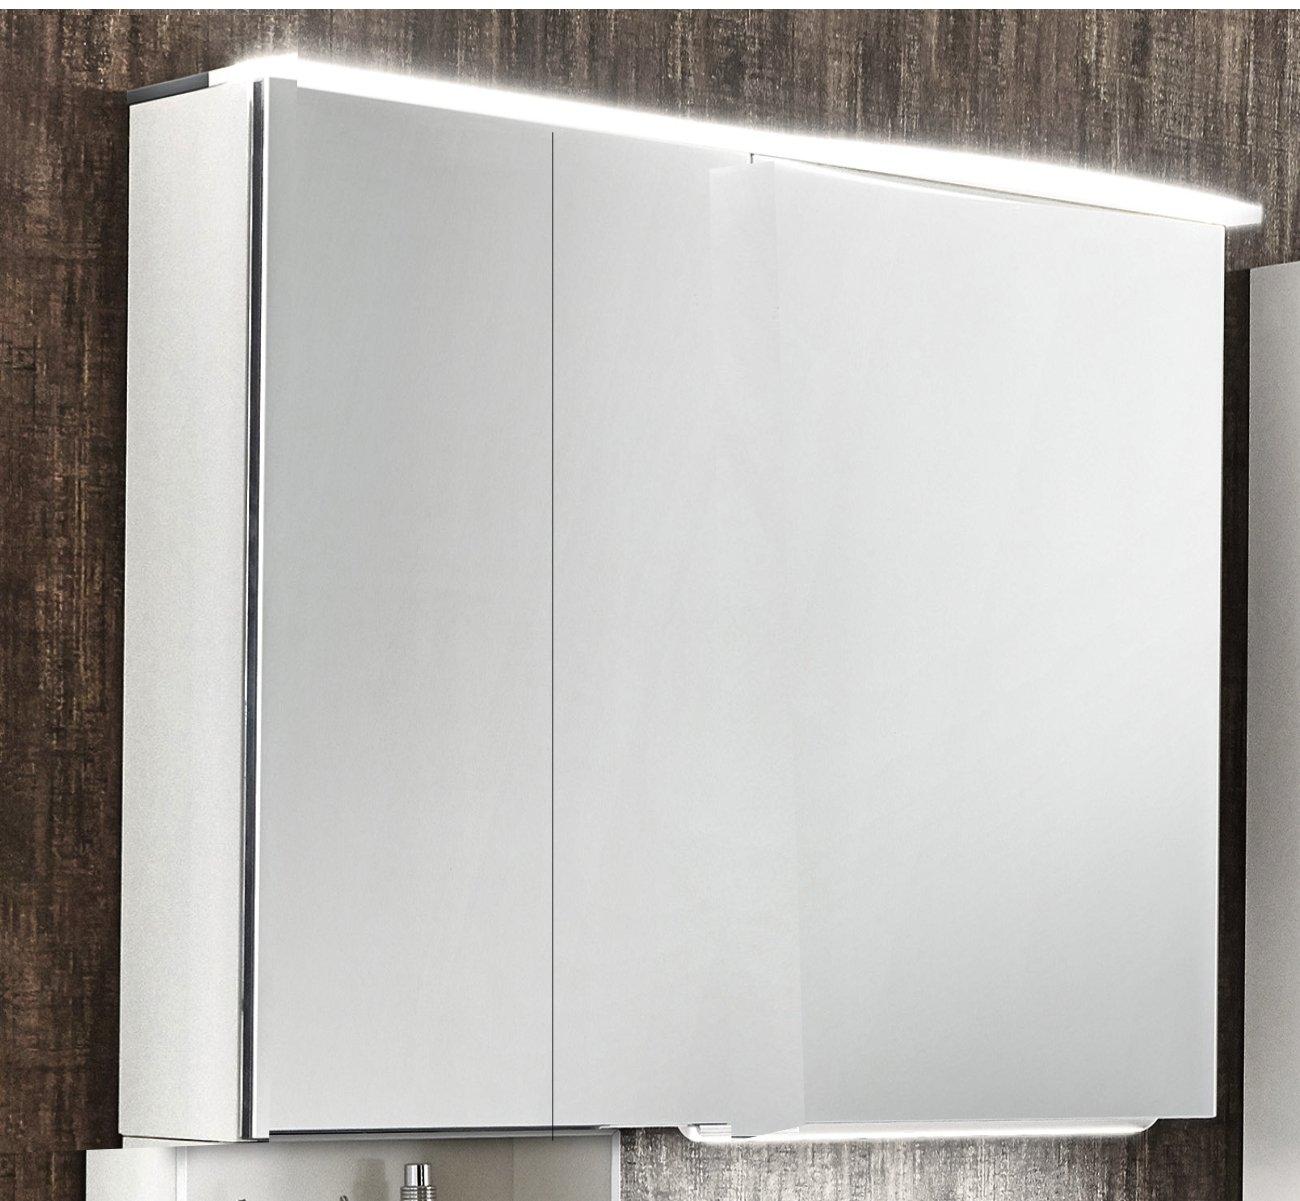 marlin bad 3090 cosmo spiegelschrank 90 cm robinie arcom center. Black Bedroom Furniture Sets. Home Design Ideas